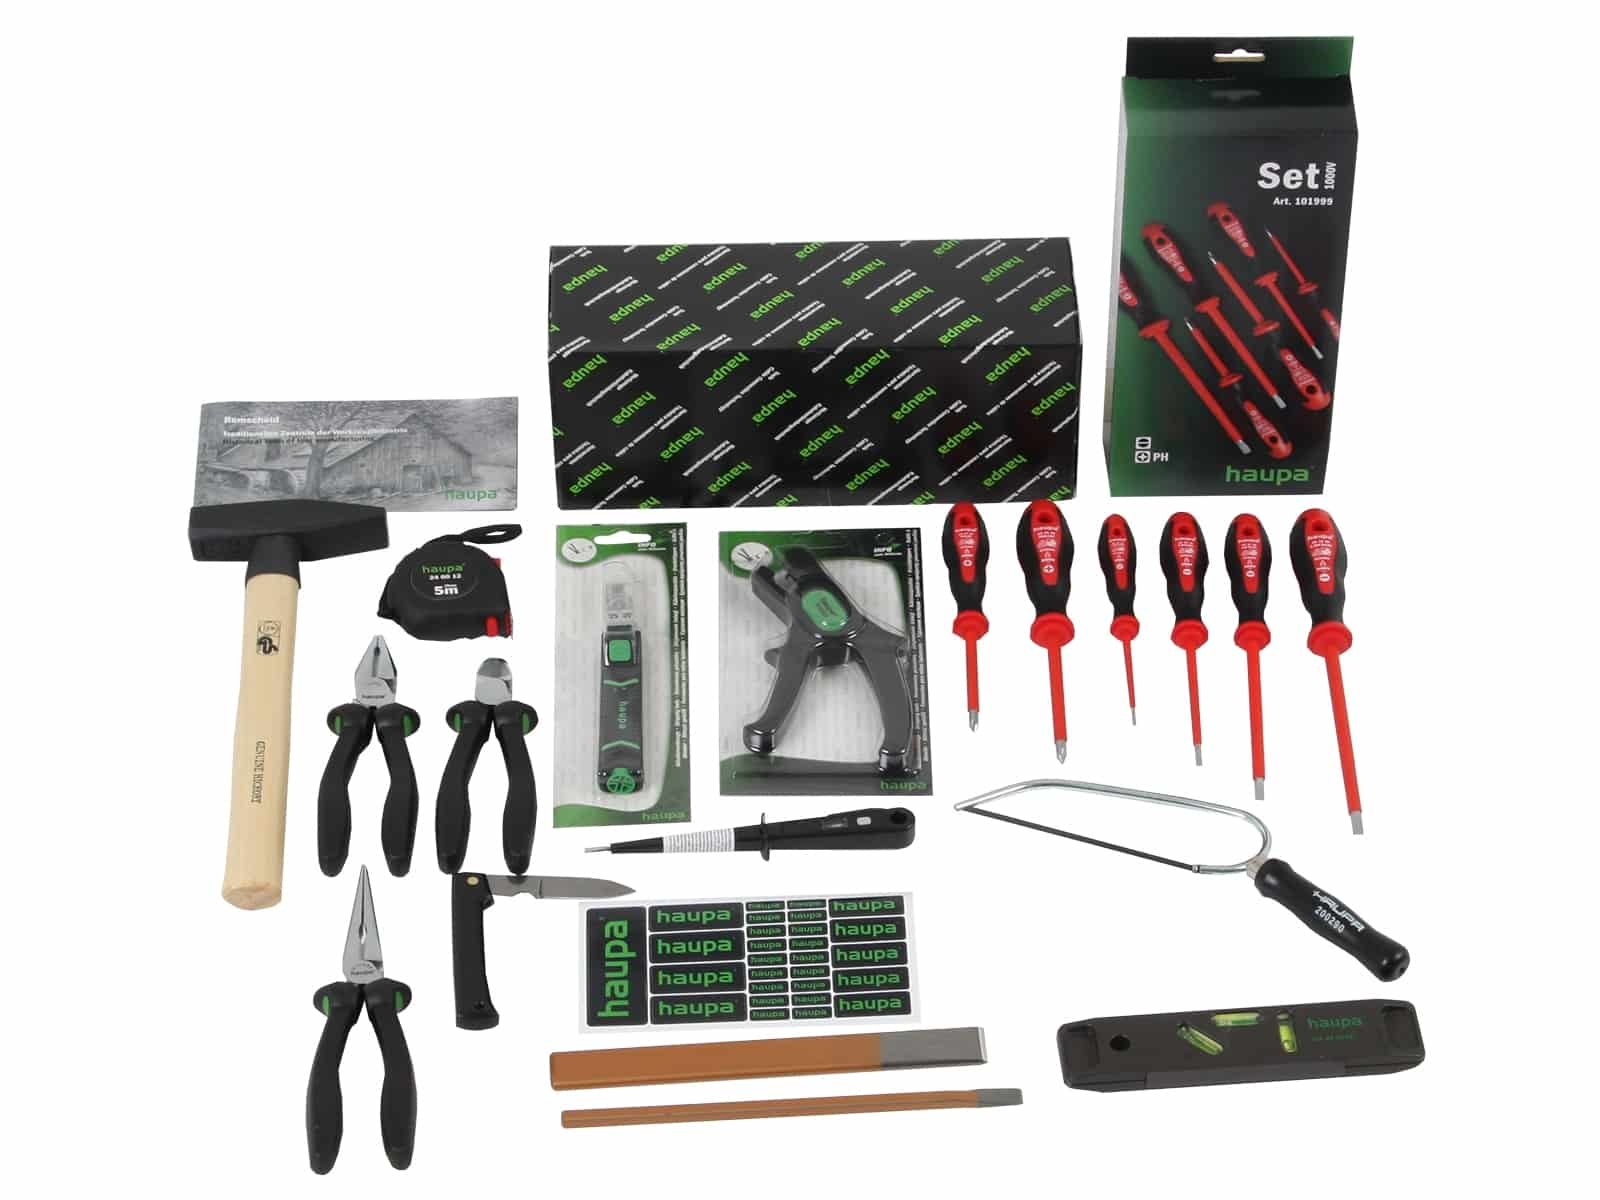 Profi-Elektriker-Werkzeugset ALPHA 20-teilig